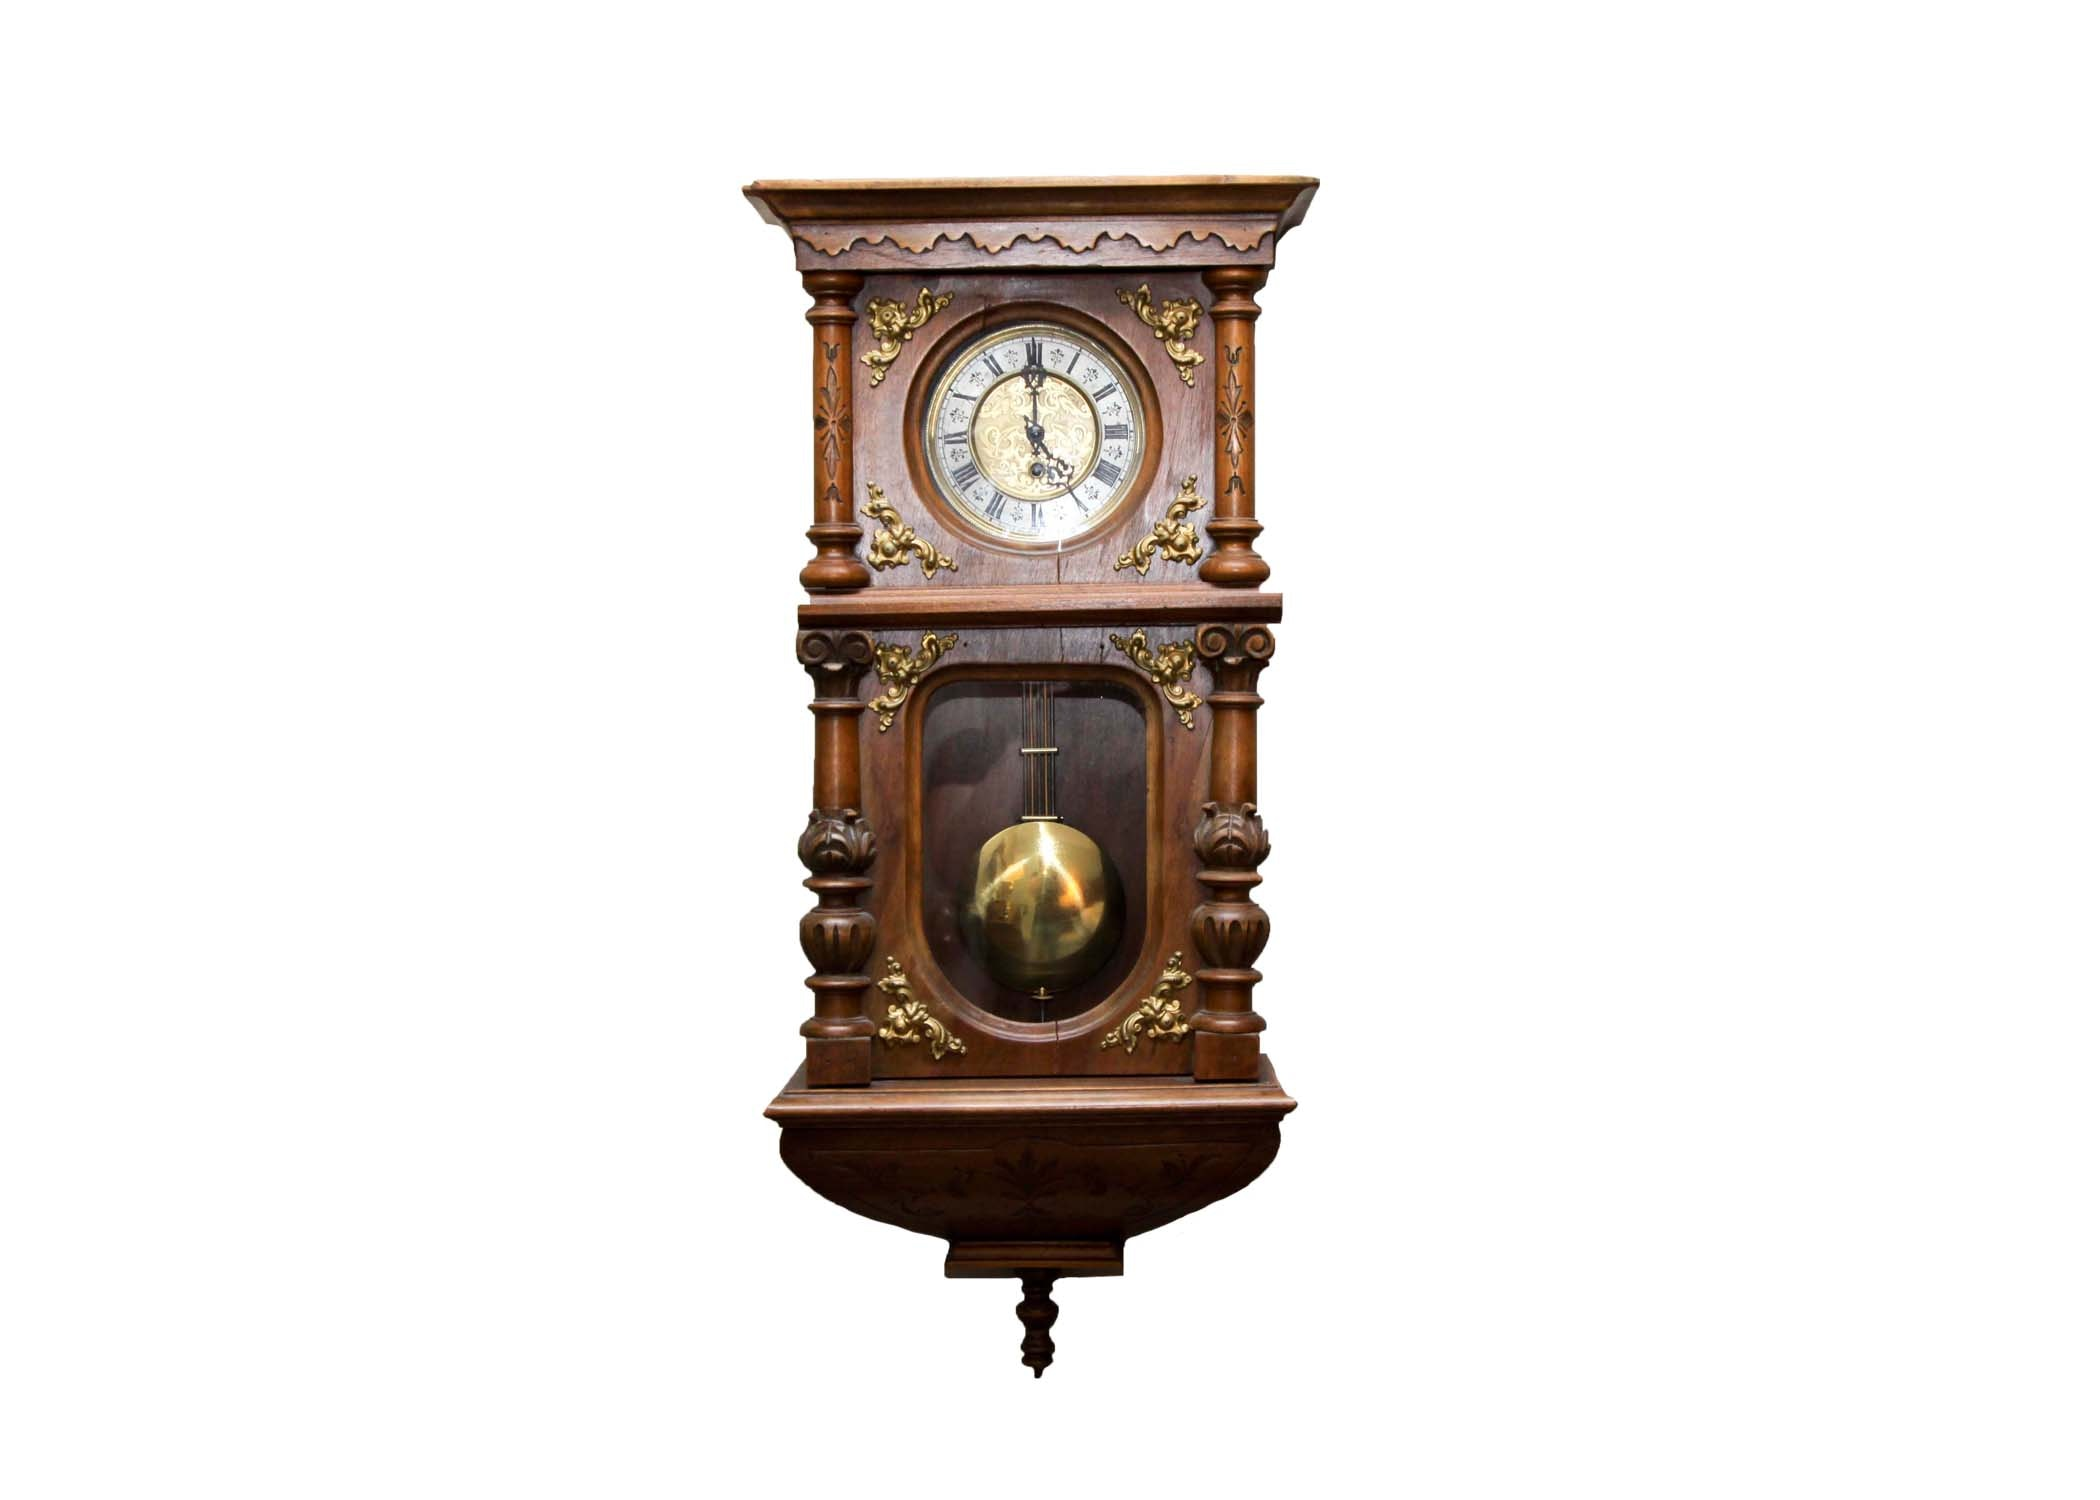 Ingraham and Co. Wall Clock